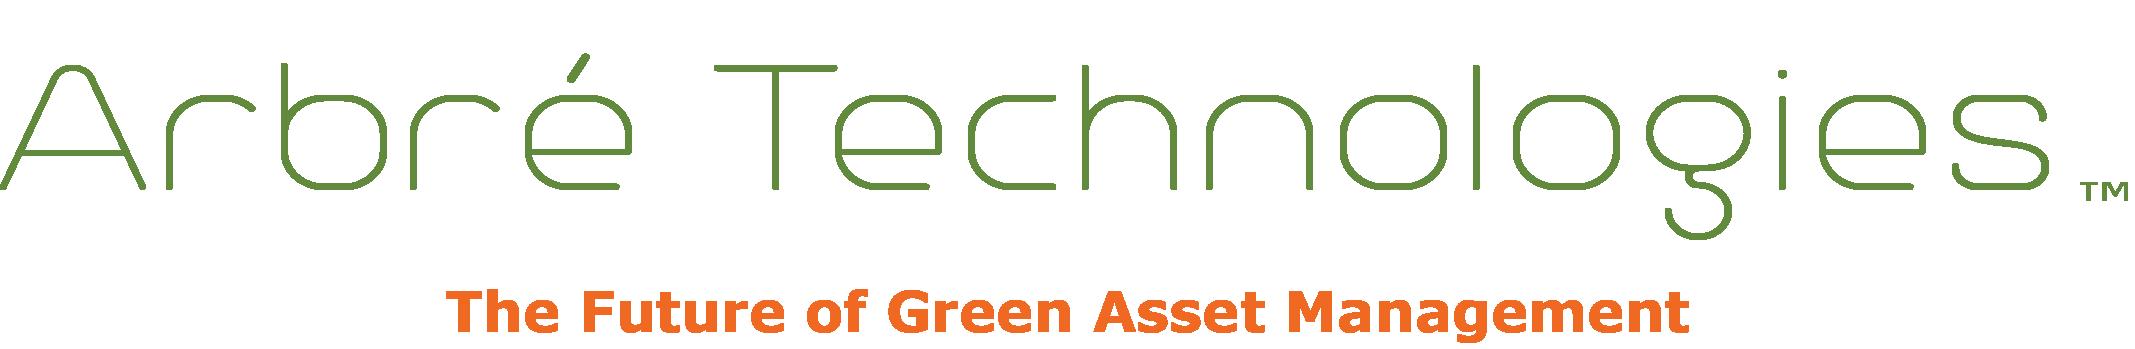 Arbre Technologies